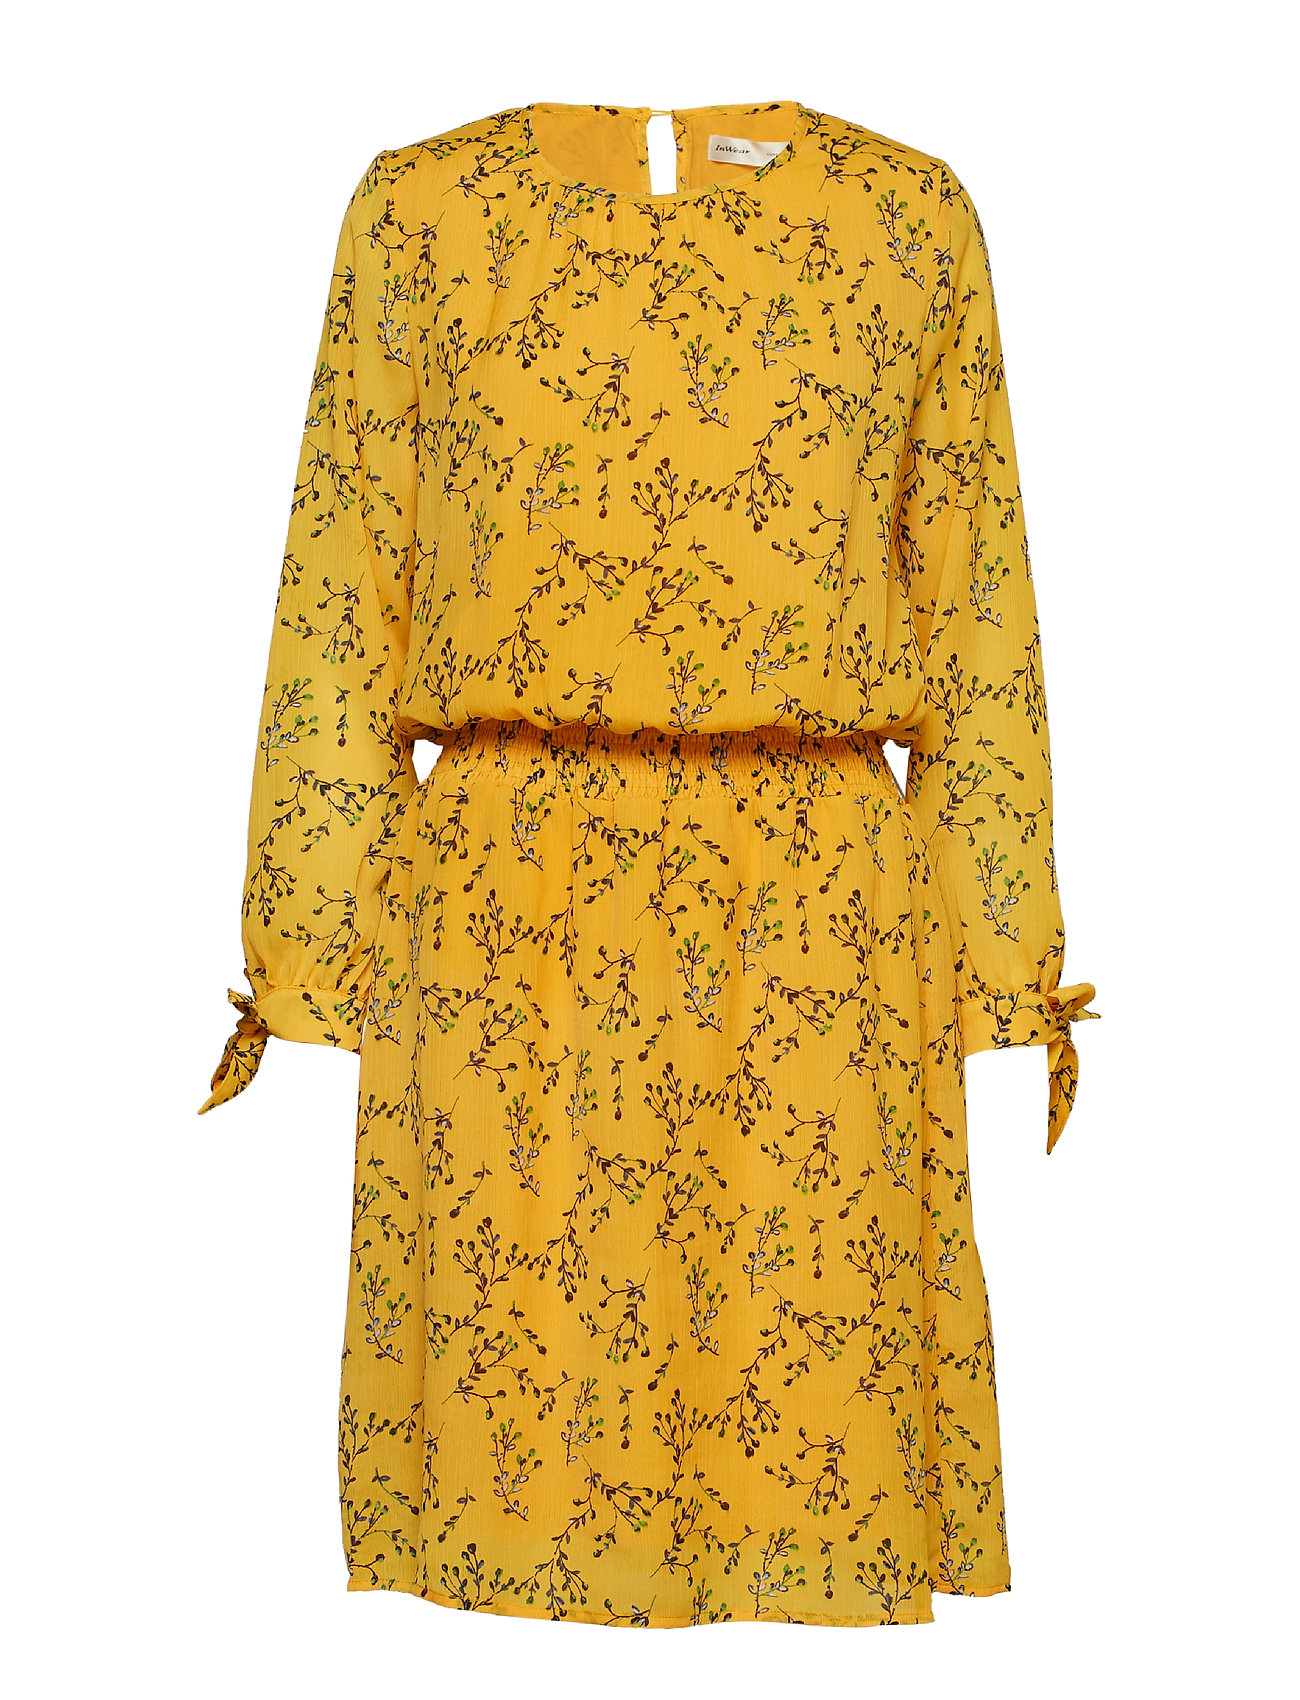 InWear Zandra Dress - YELLOW FLORAL BRANCH